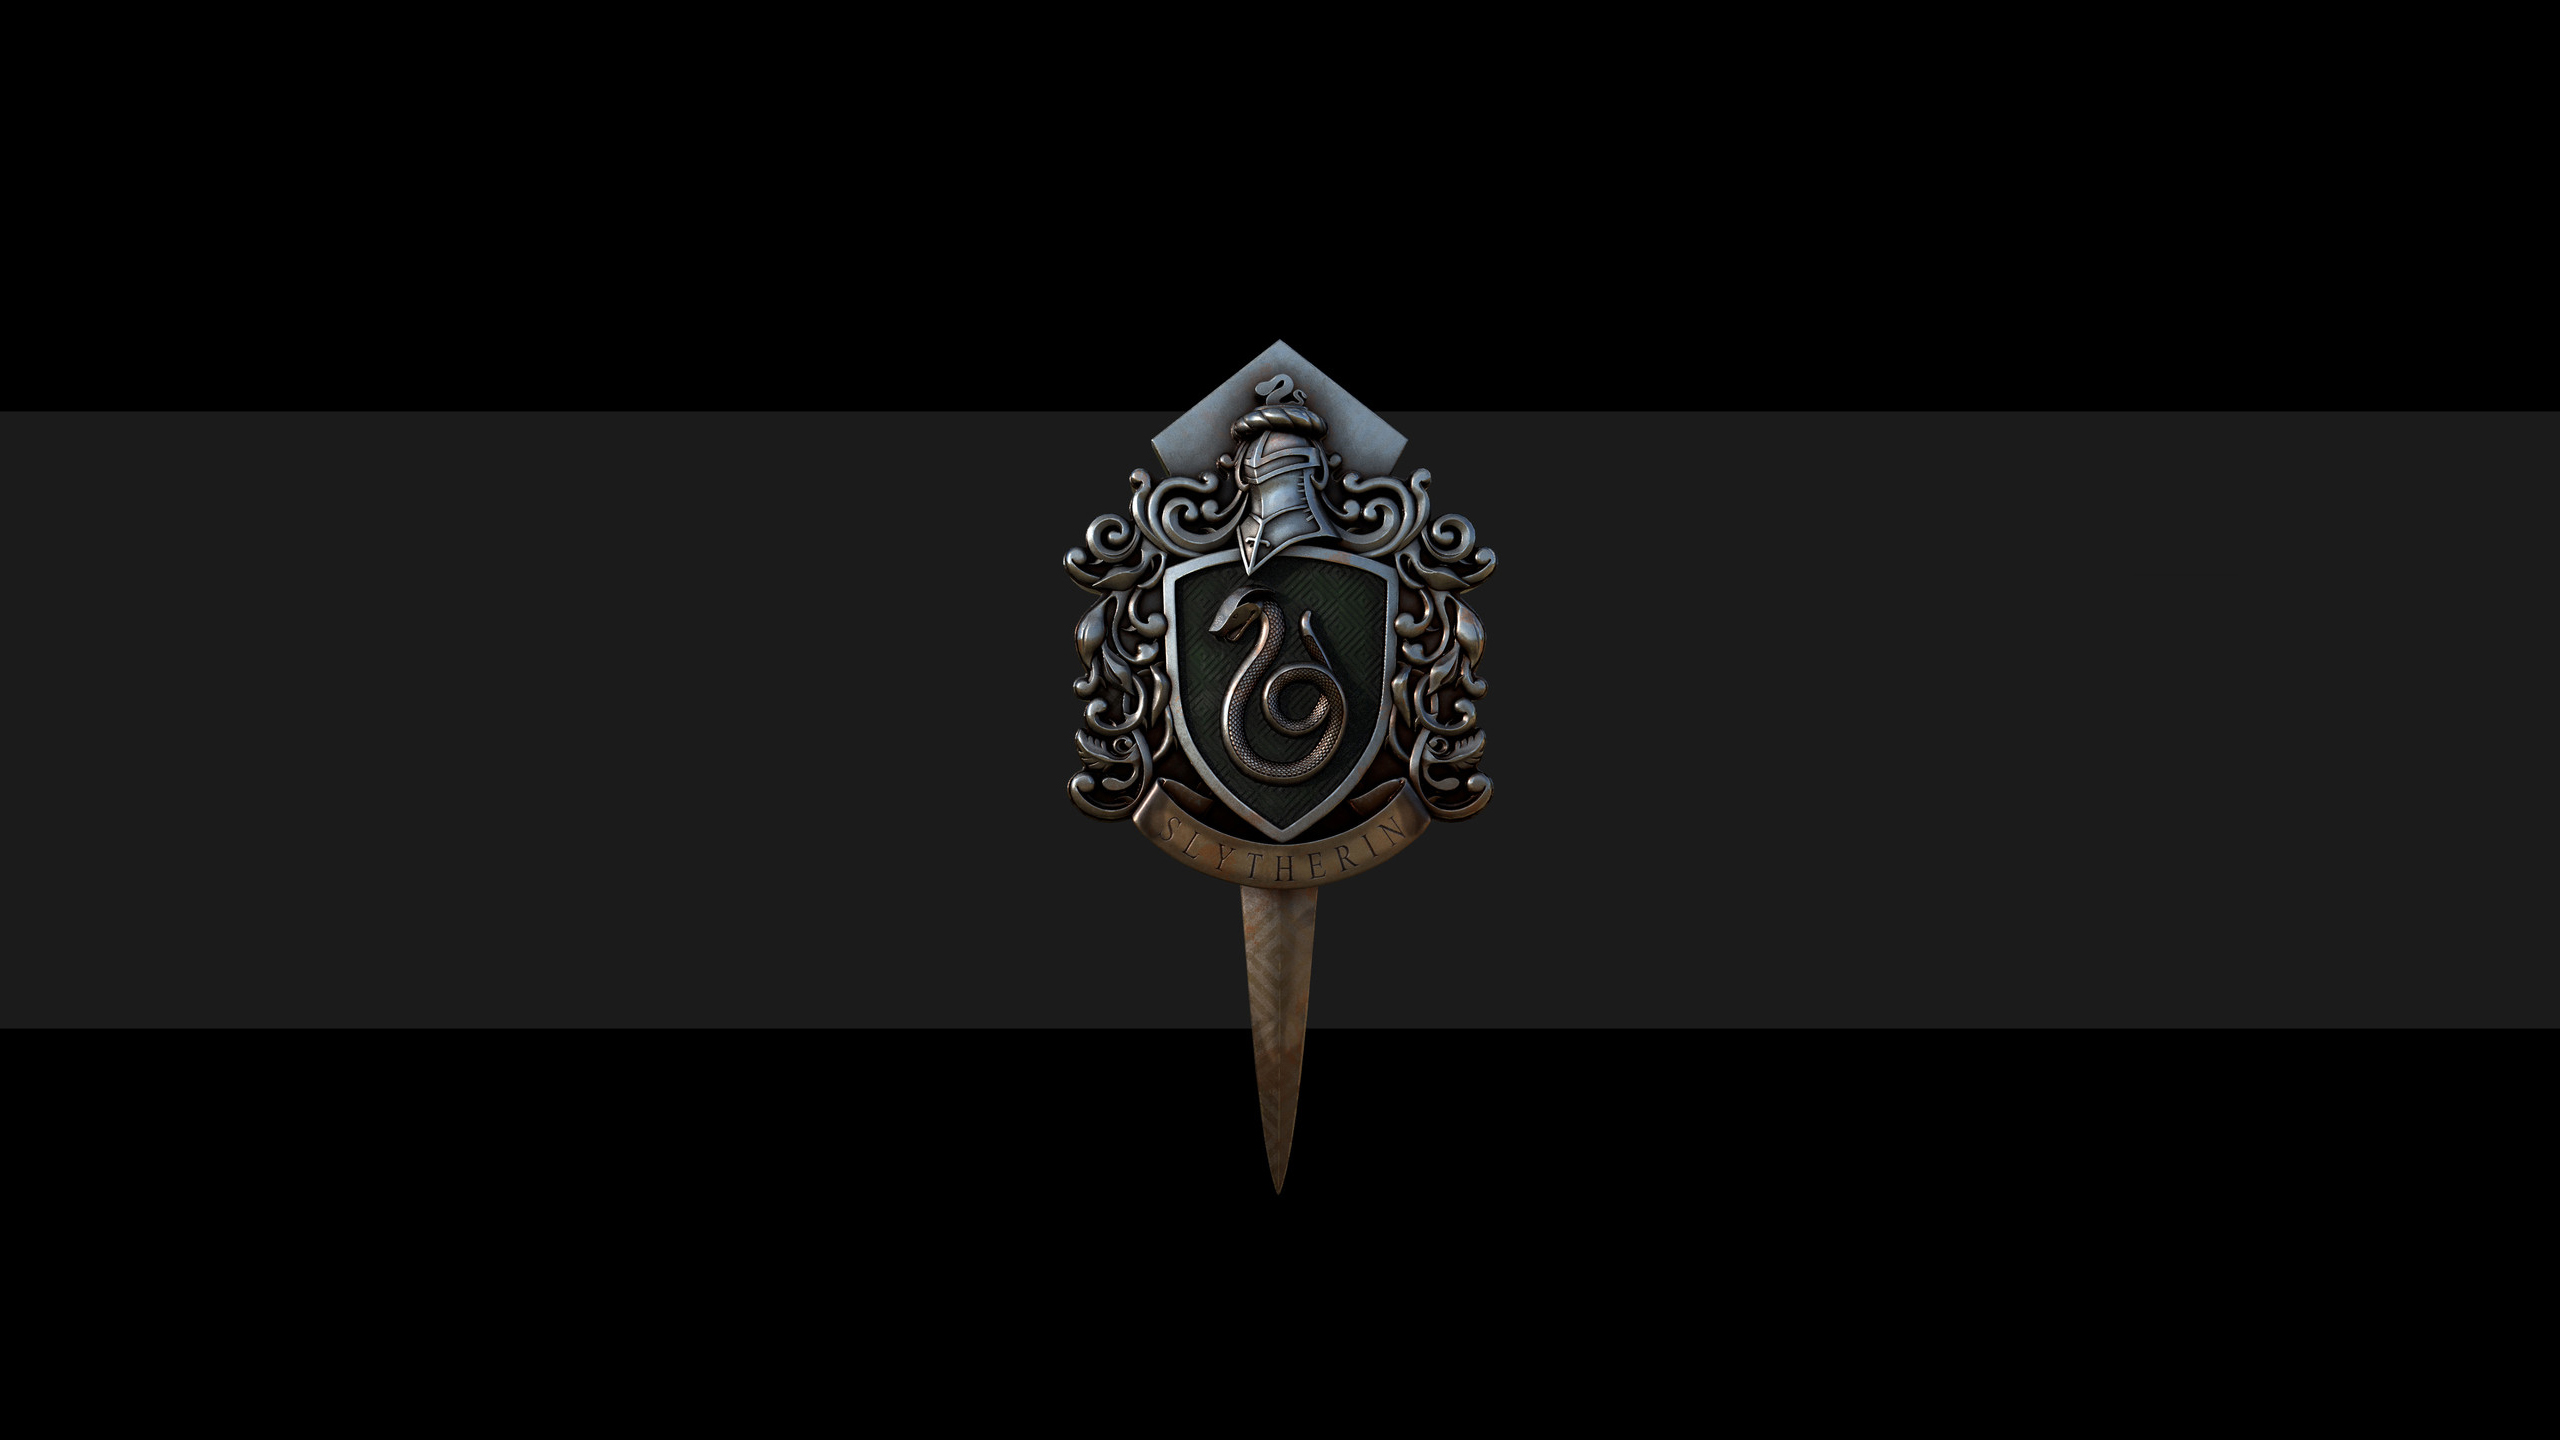 Fondos de pantalla Insignia Slytherin de Harry Potter